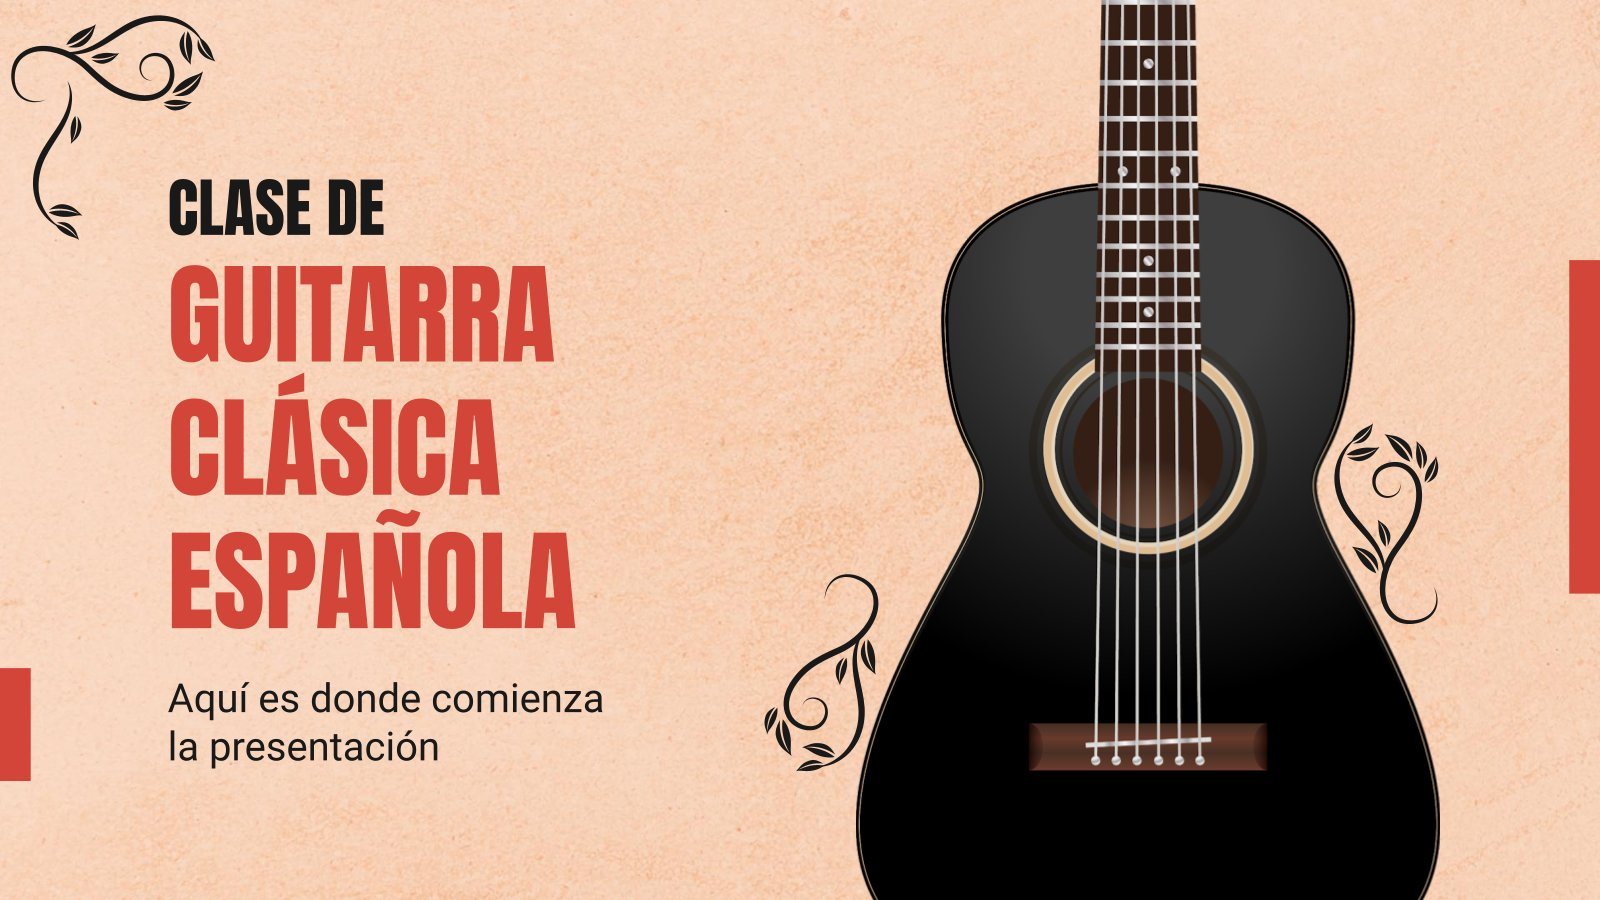 Plantilla de presentación Clase de guitarra clásica española